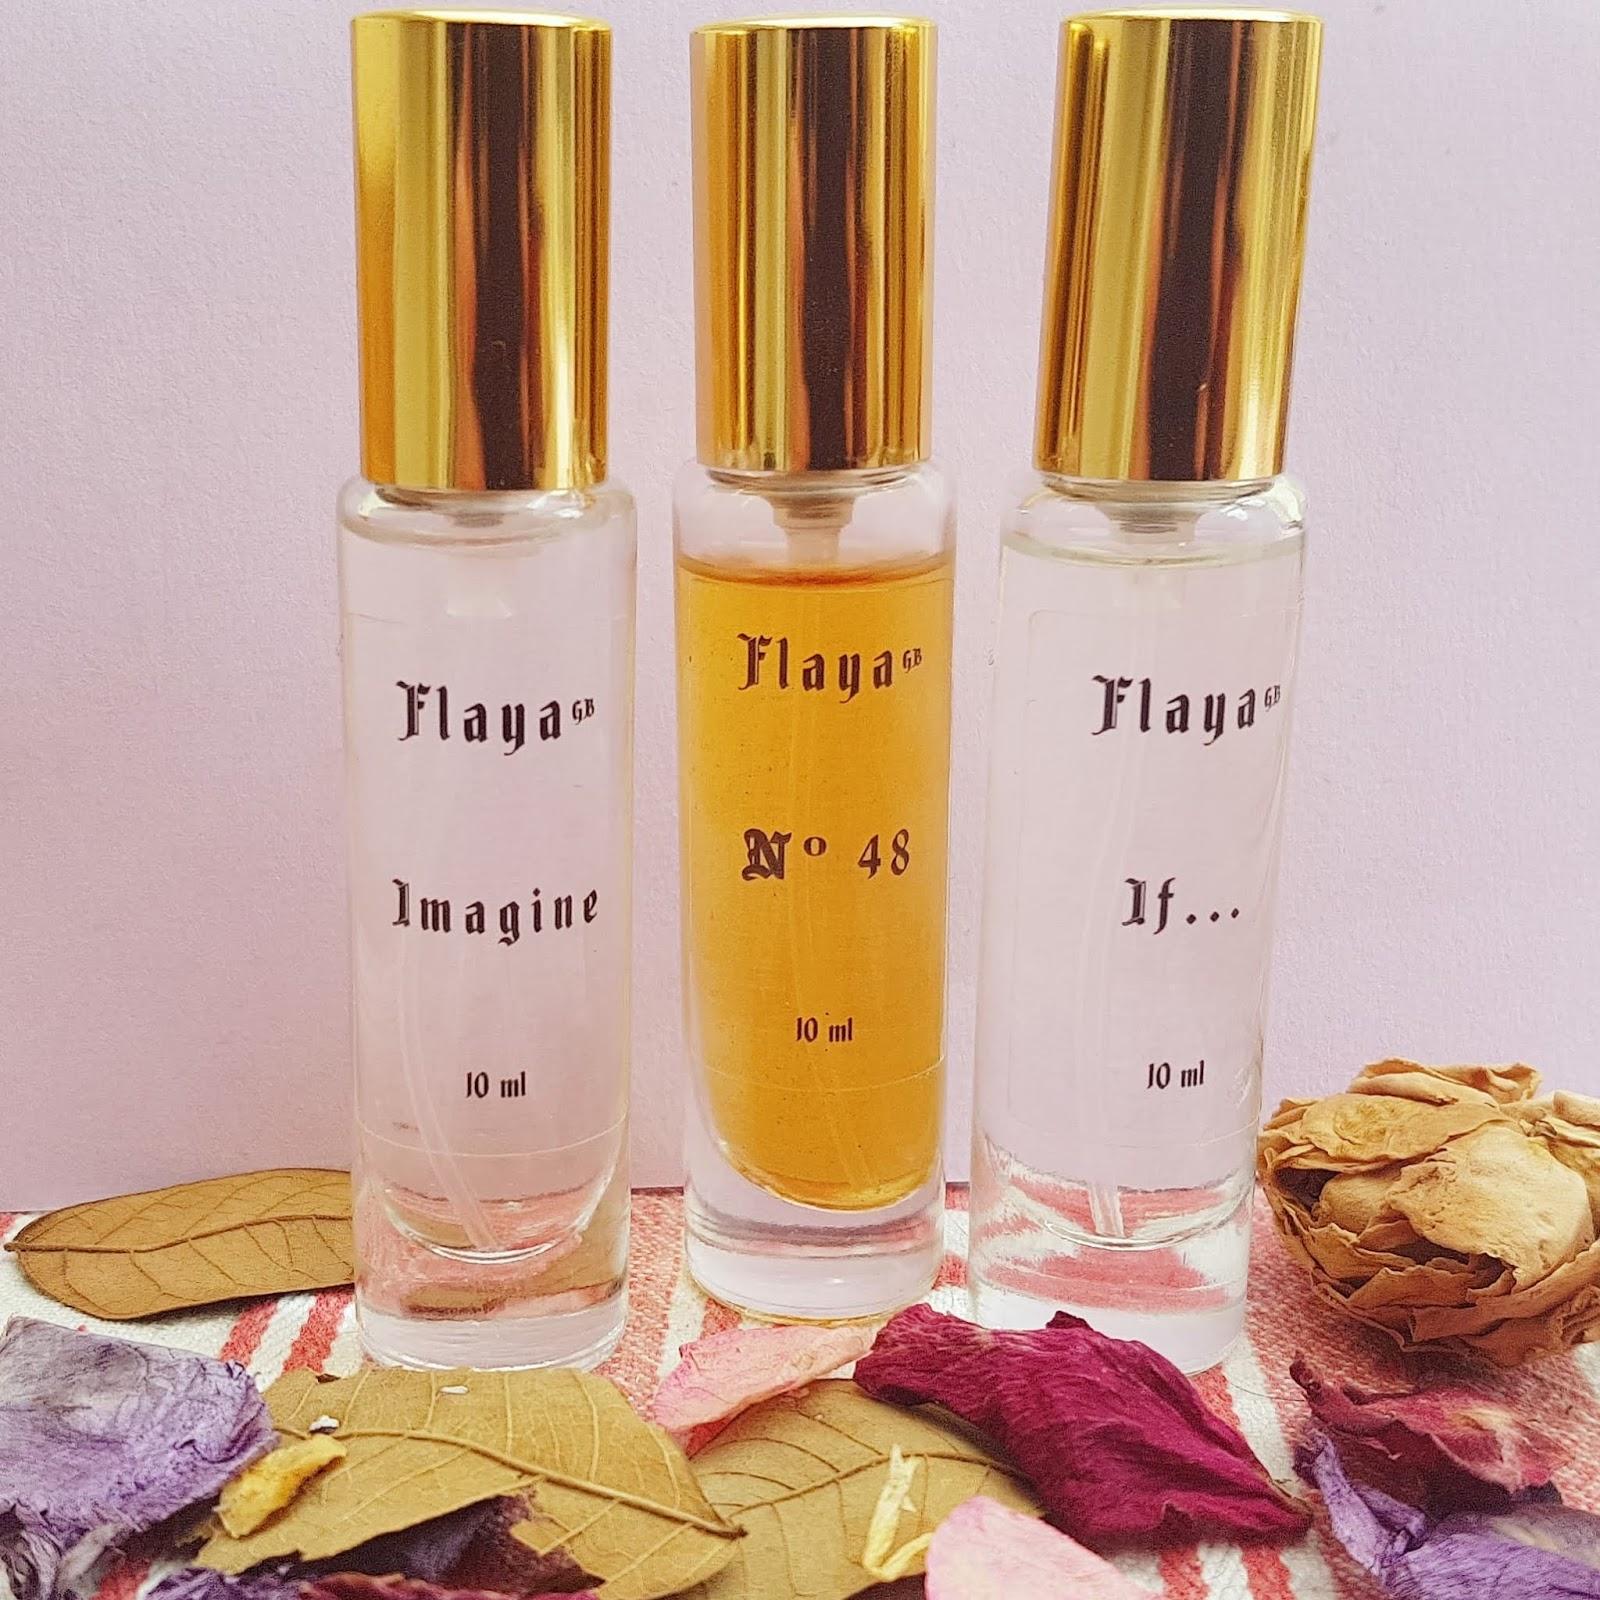 Flaya Eau de Parfum Perfume Review